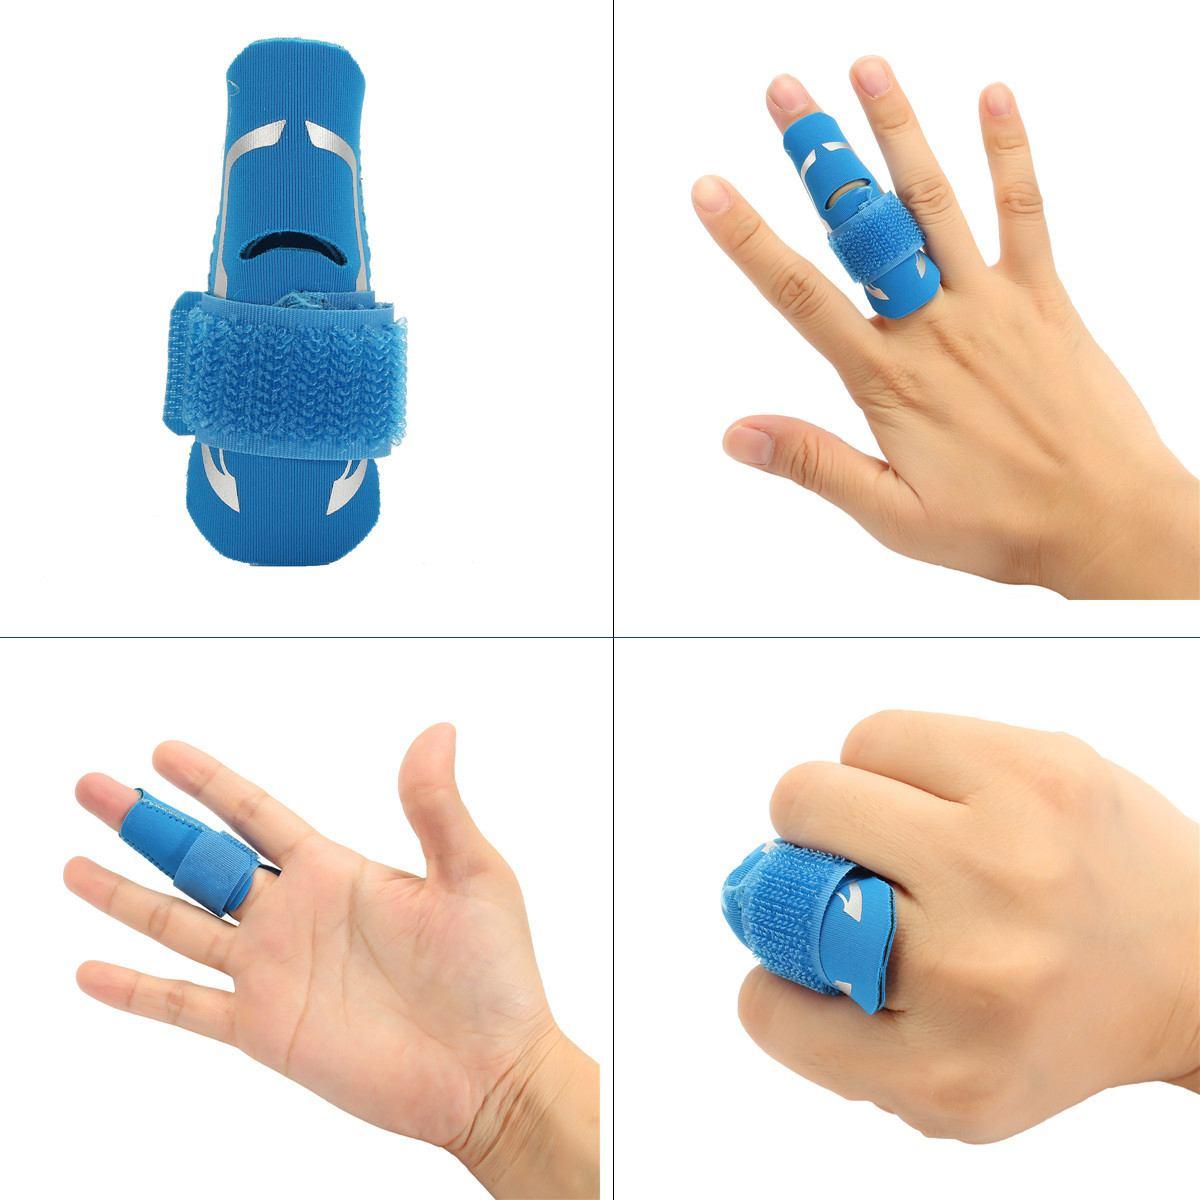 Novo dedo de basquete proteger cinta esporte